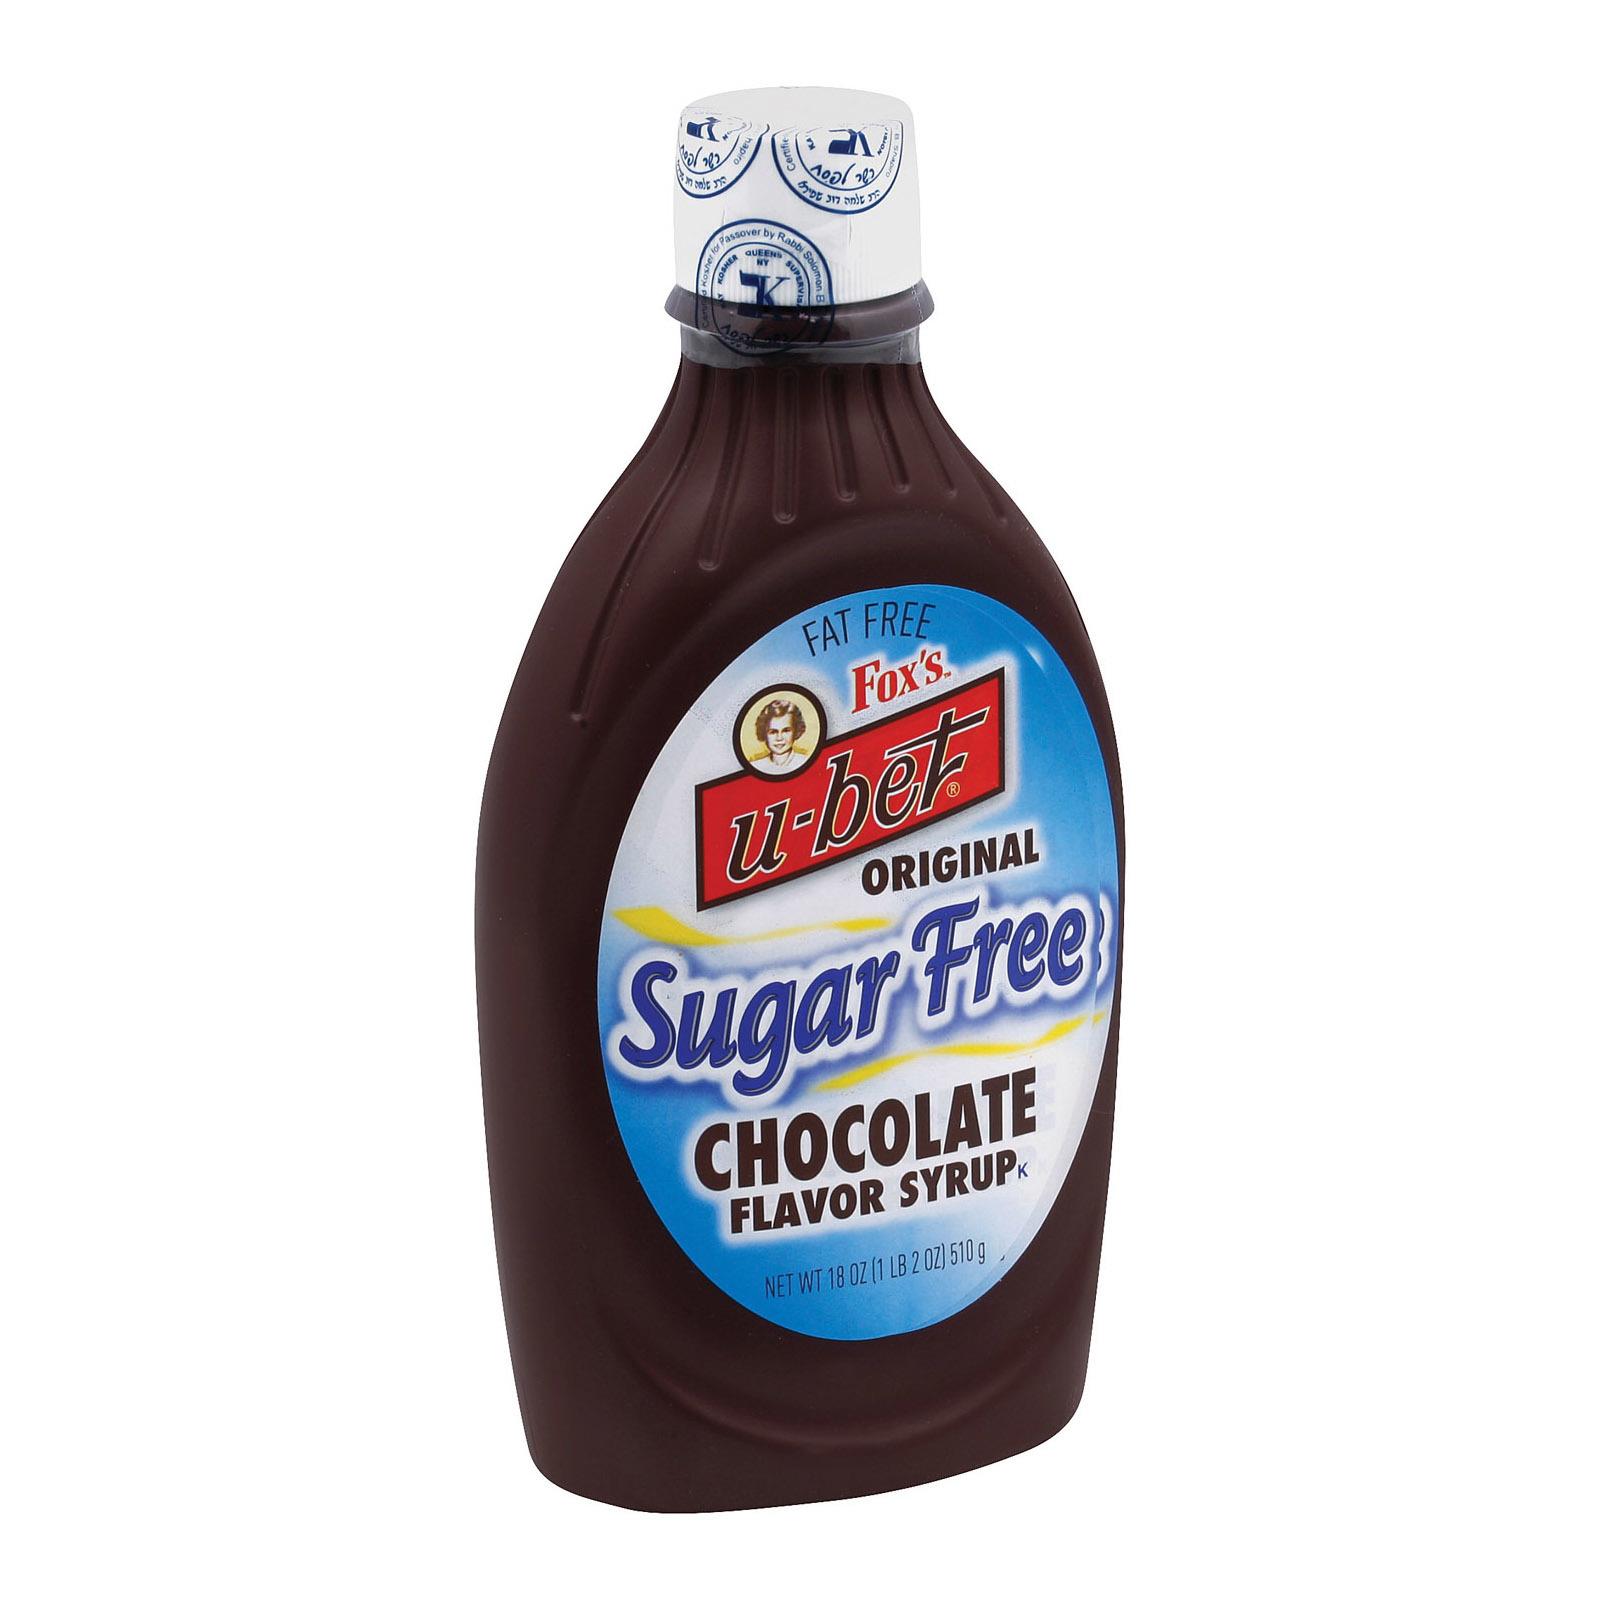 Fox's U - Bet Chocolate Syrup - Chocolate - 18 oz.